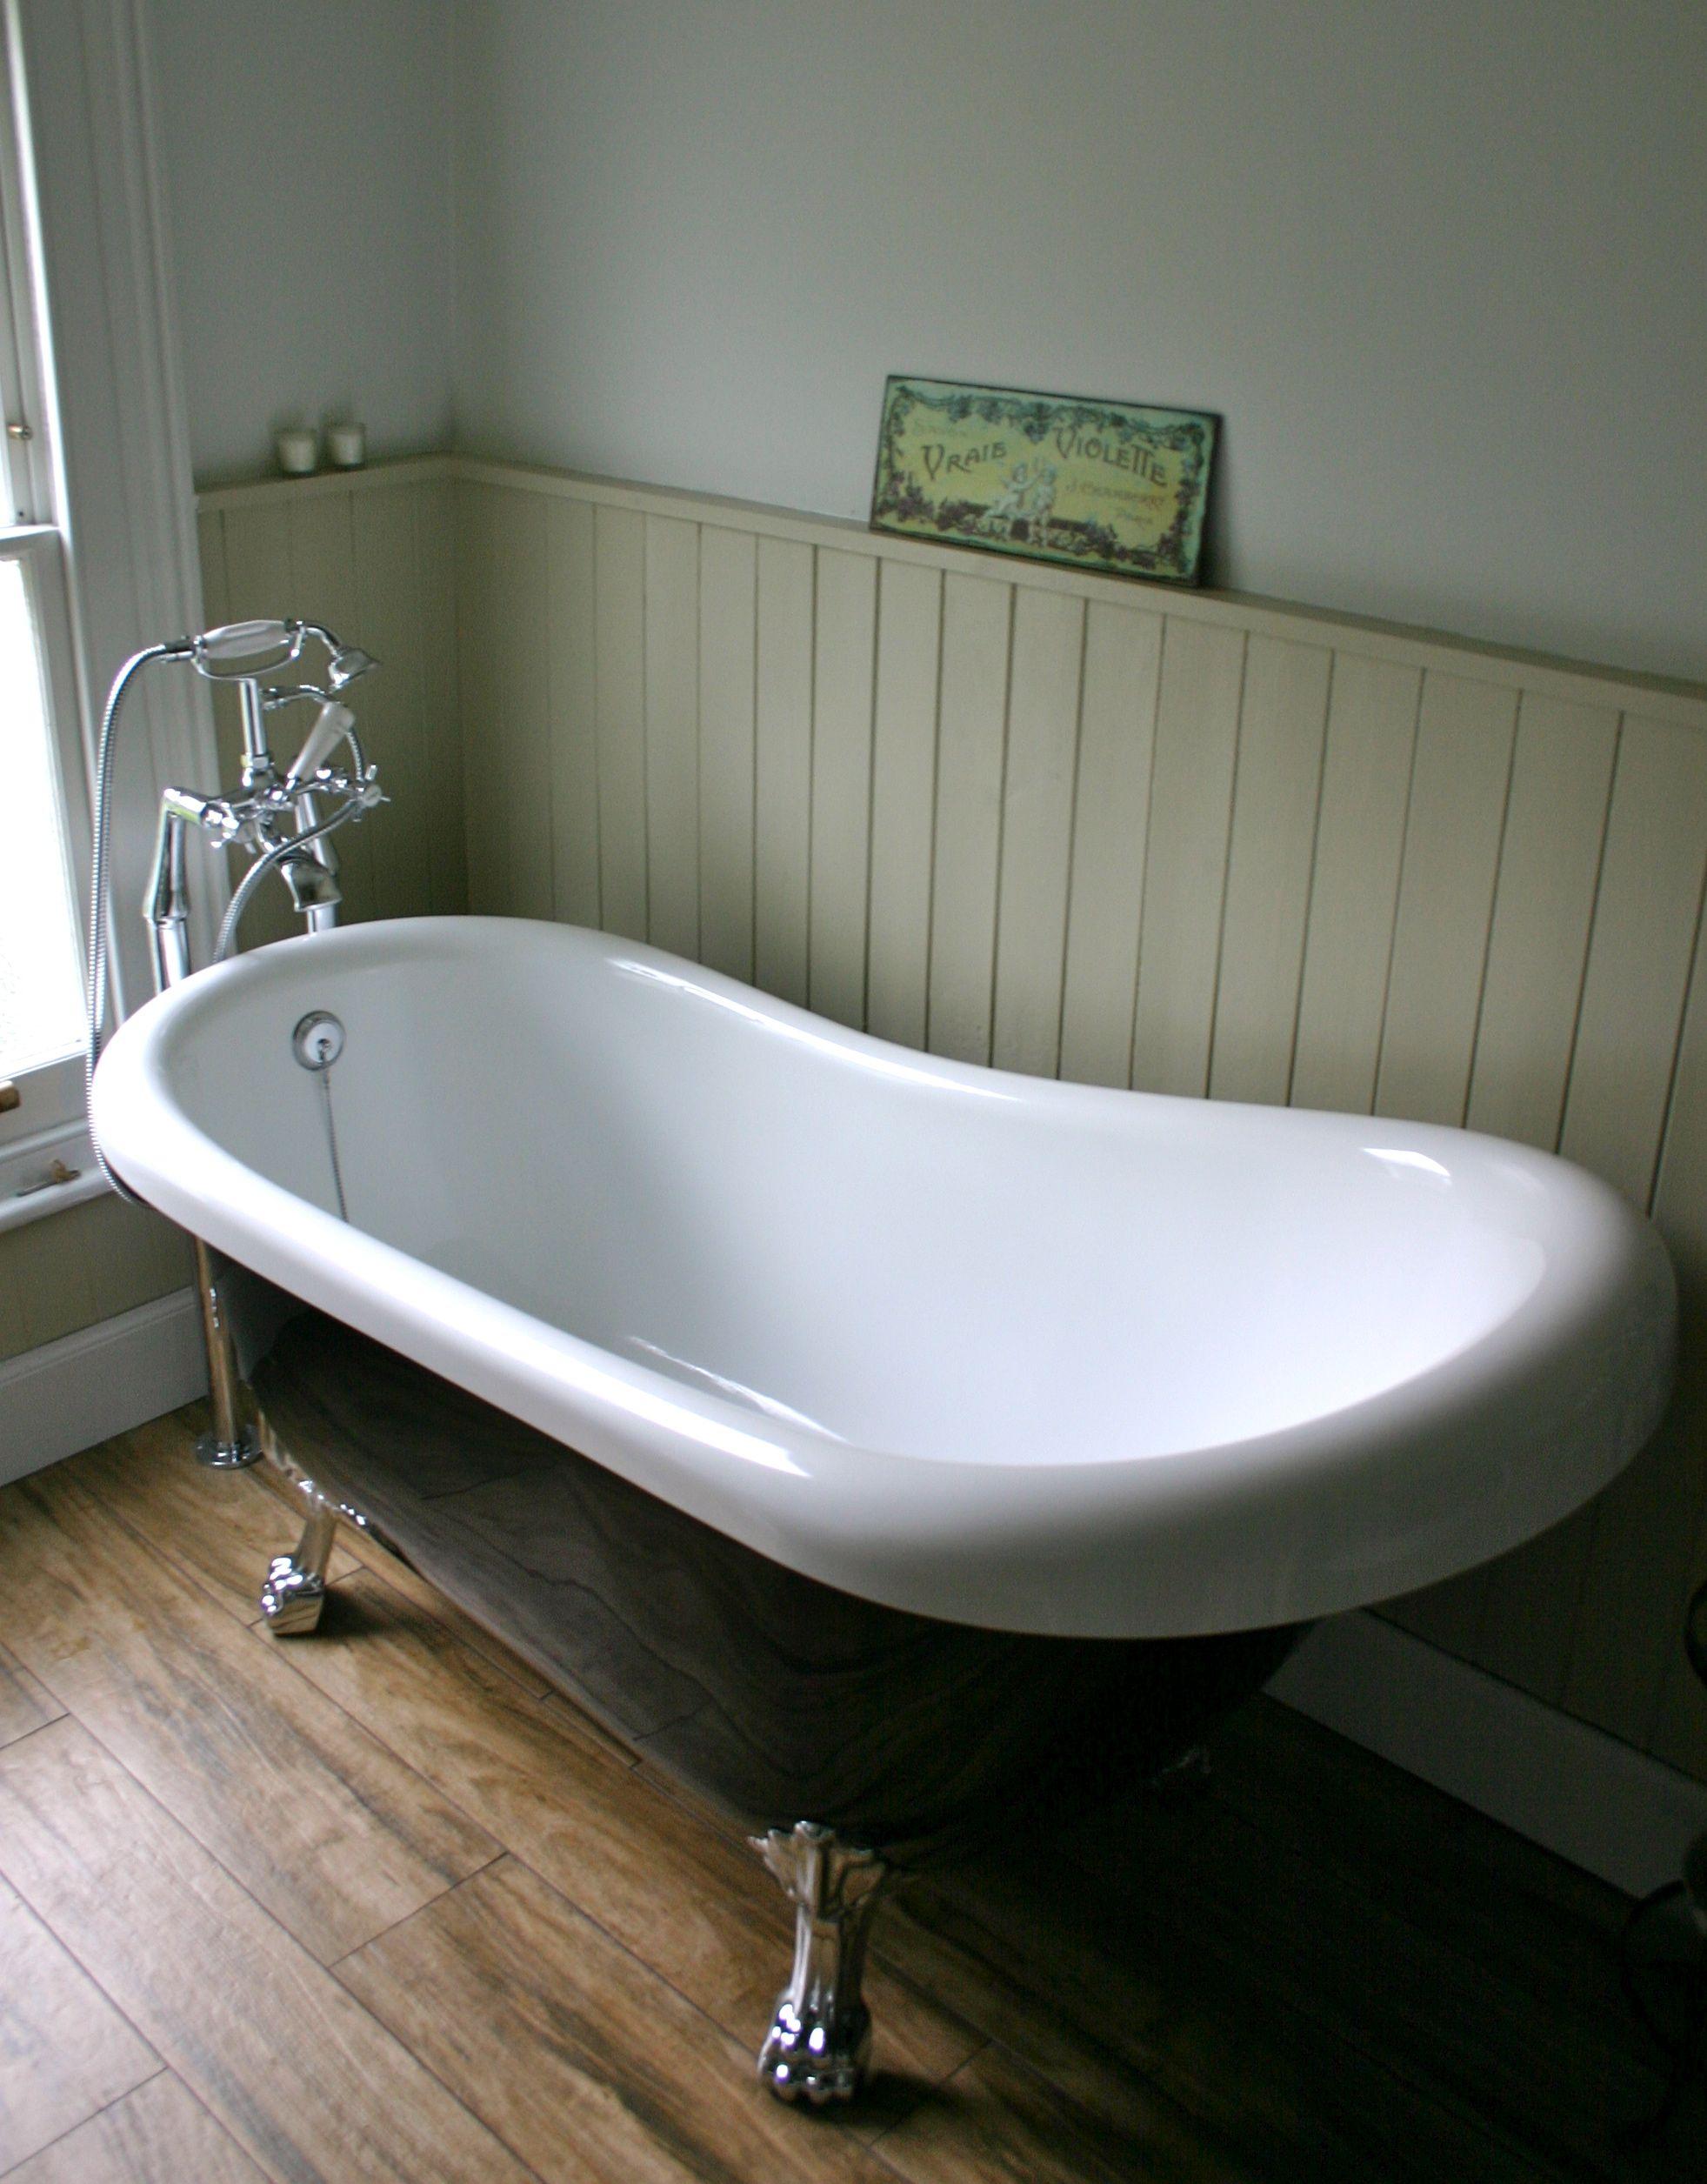 My bathroom make over - roll top bath | Vintage bathroom | Pinterest ...